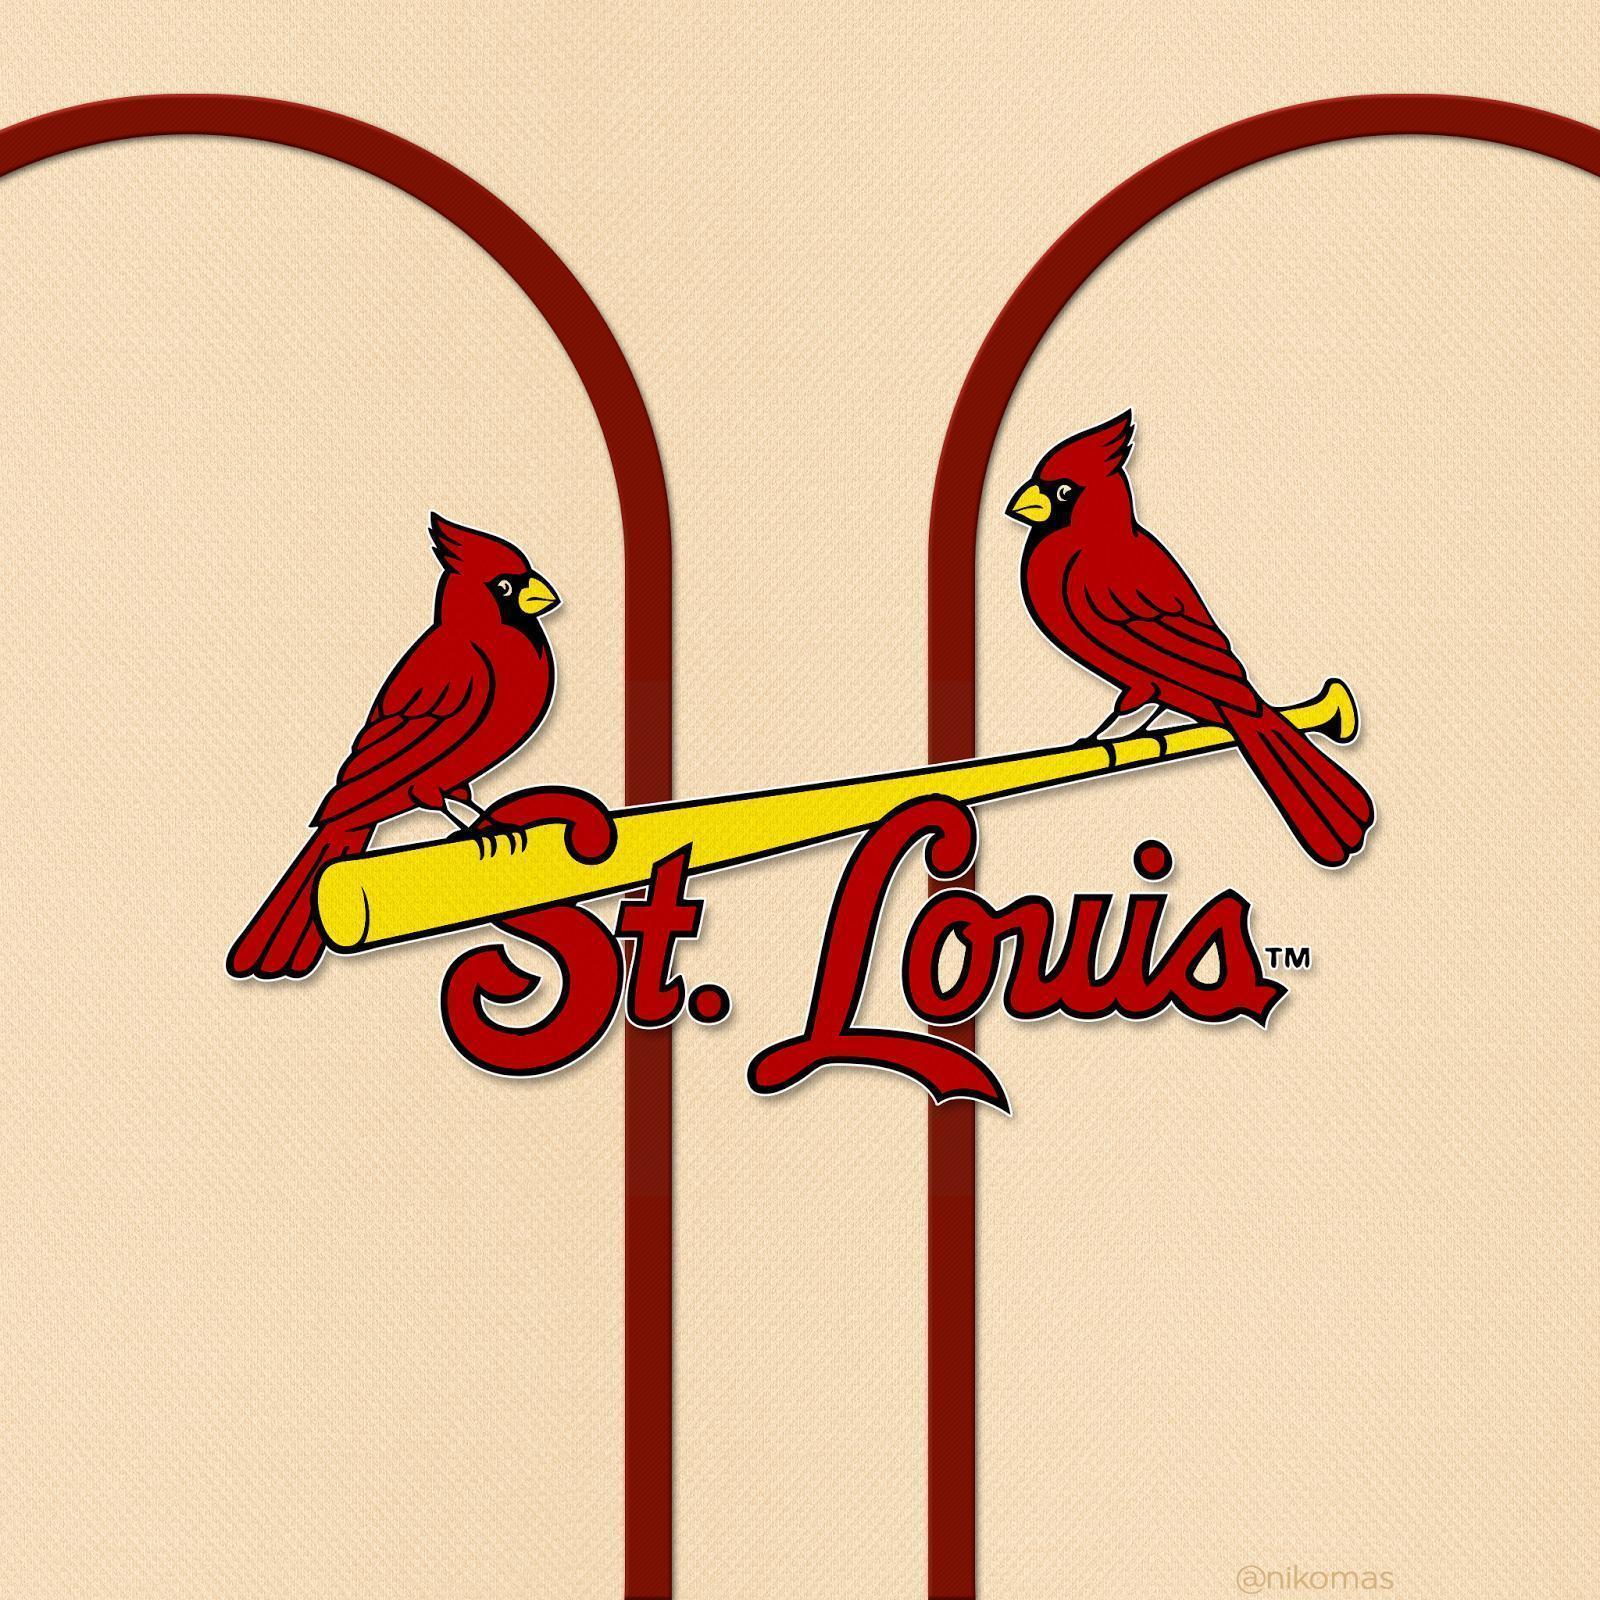 cardinals wallpaper - photo #28